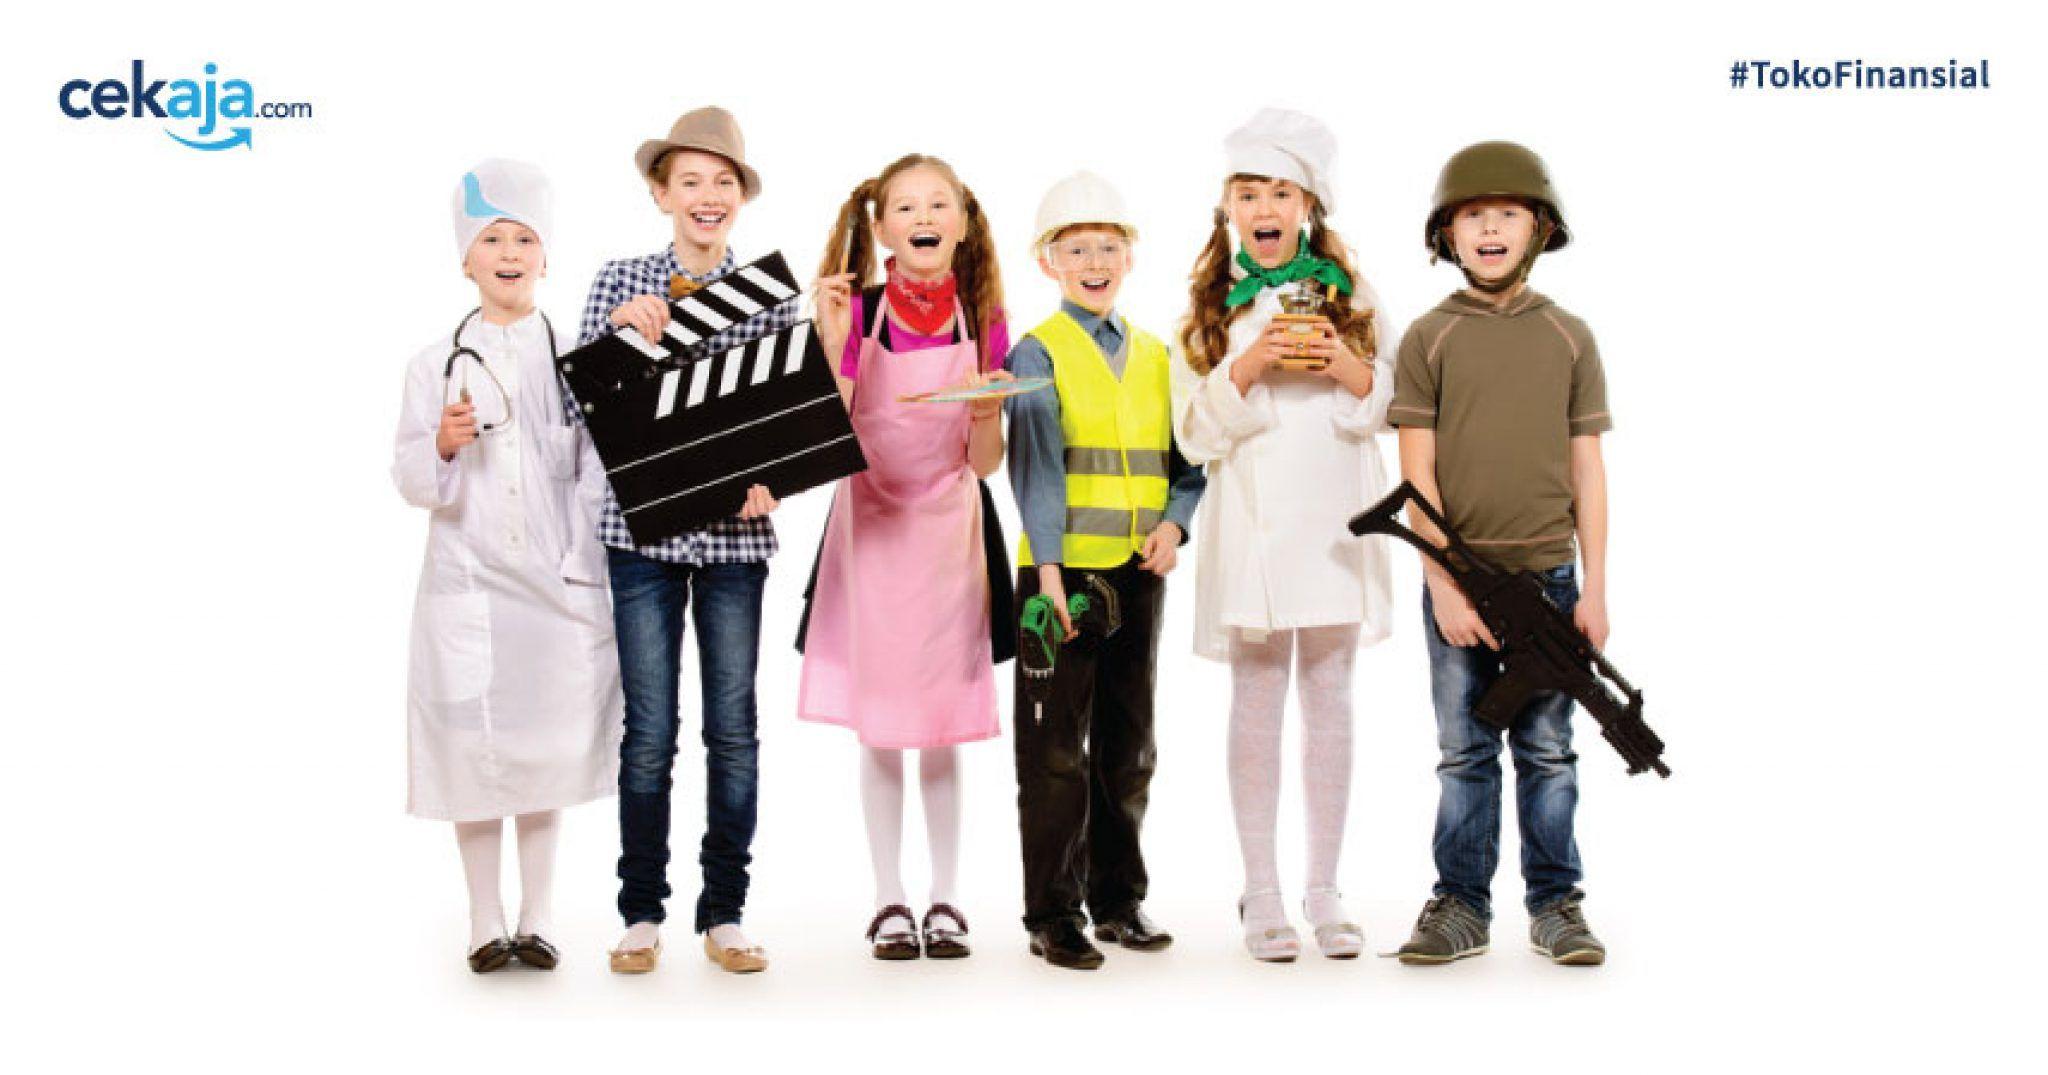 Usaha Modal Kecil | Anak, Sekolah, Ide